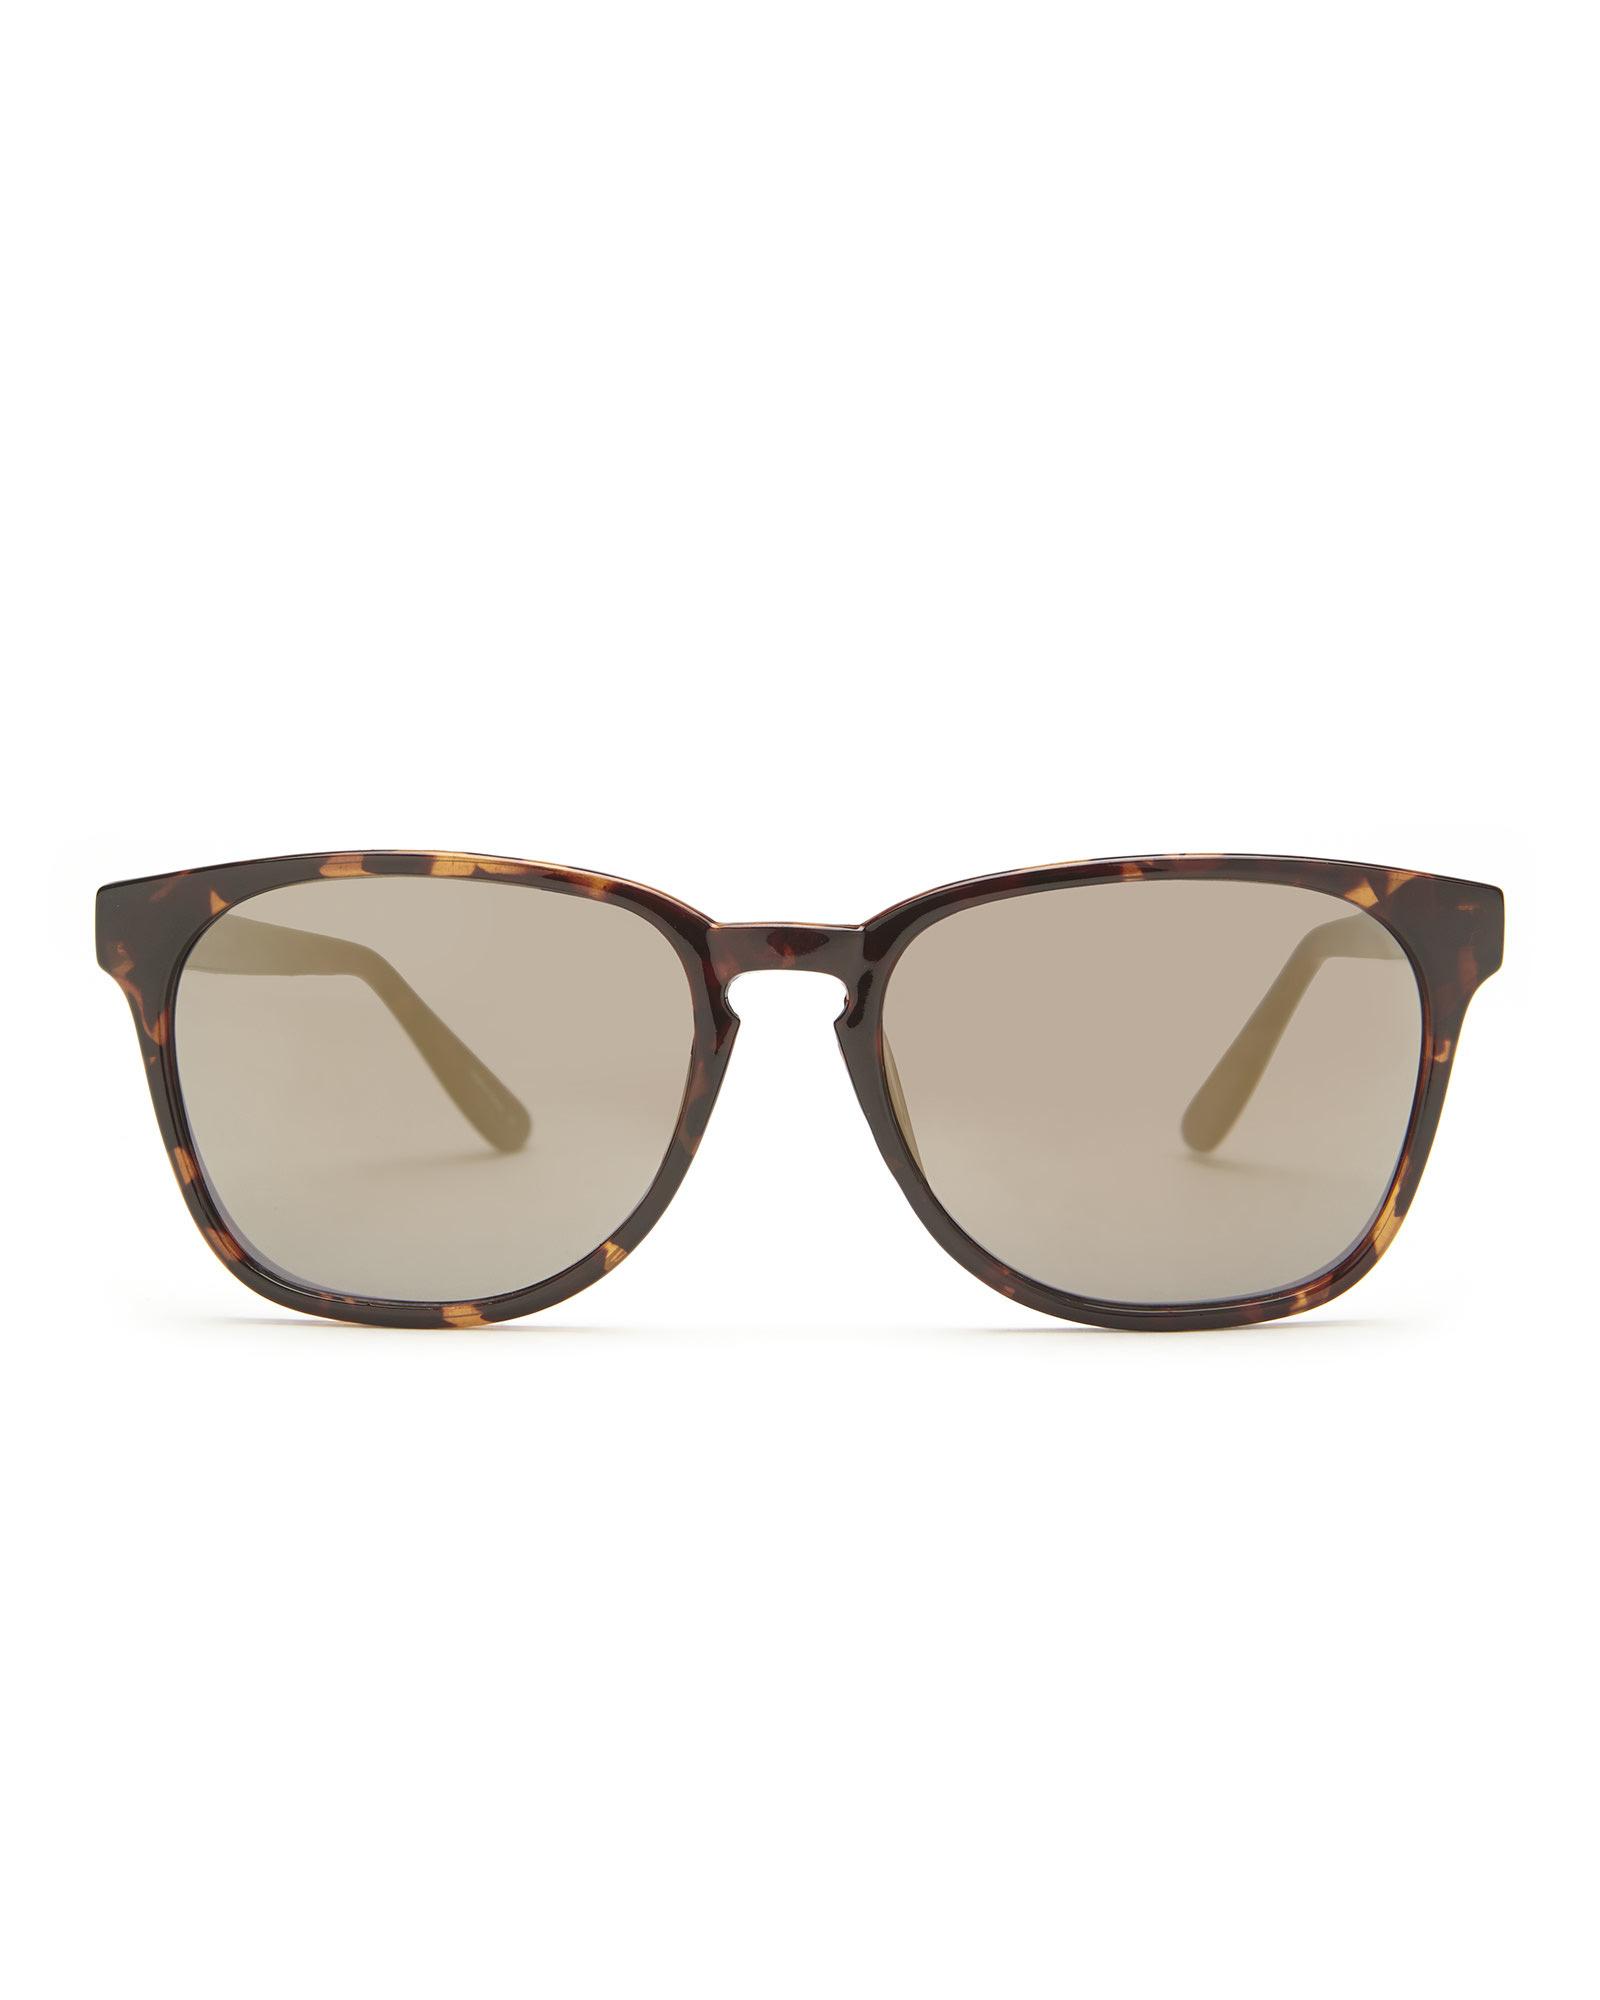 Cole Han Sunglasses  cole haan c7048 tortoises look wayfarer sunglasses in brown